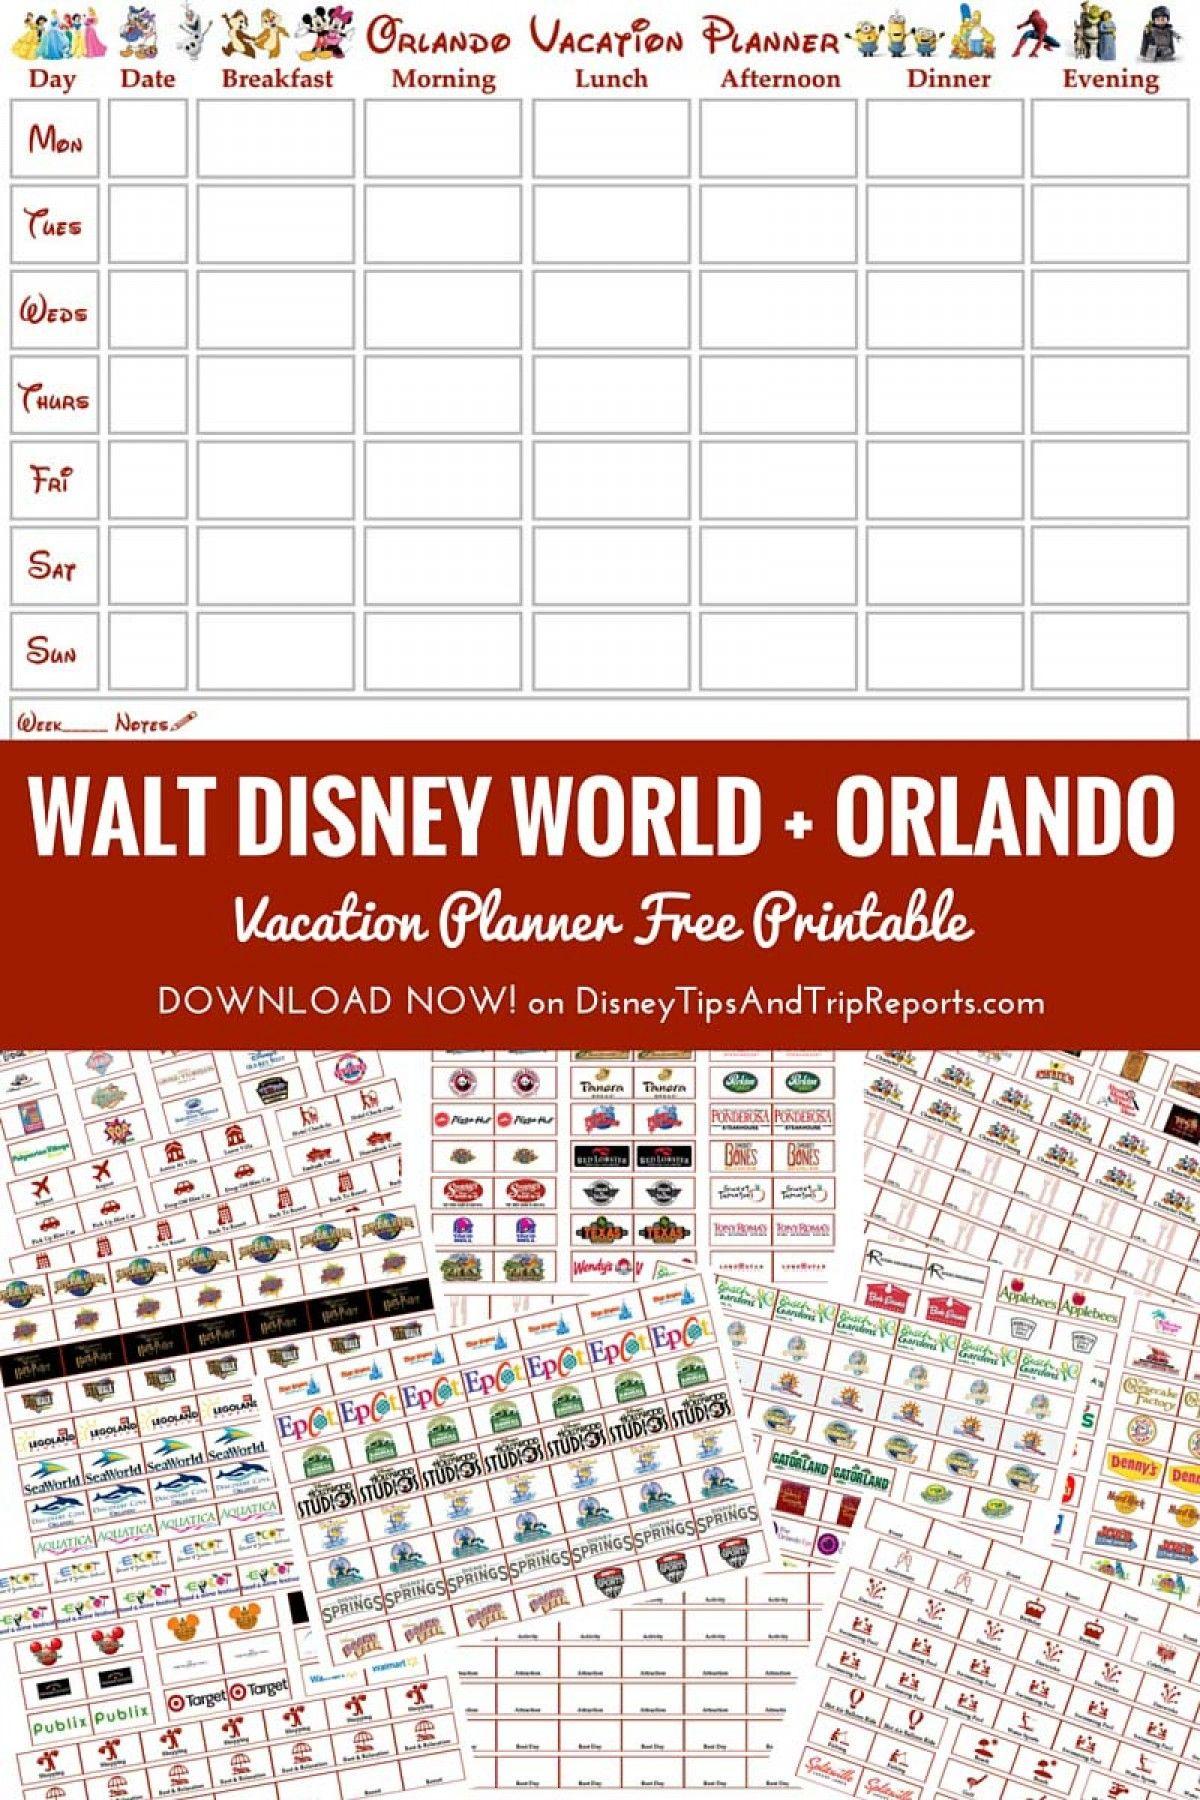 Walt Disney World Orlando Vacation Planner Free Printable Disney Tips Trip Reports Disney Vacation Planner Disney Planner Walt Disney World Orlando